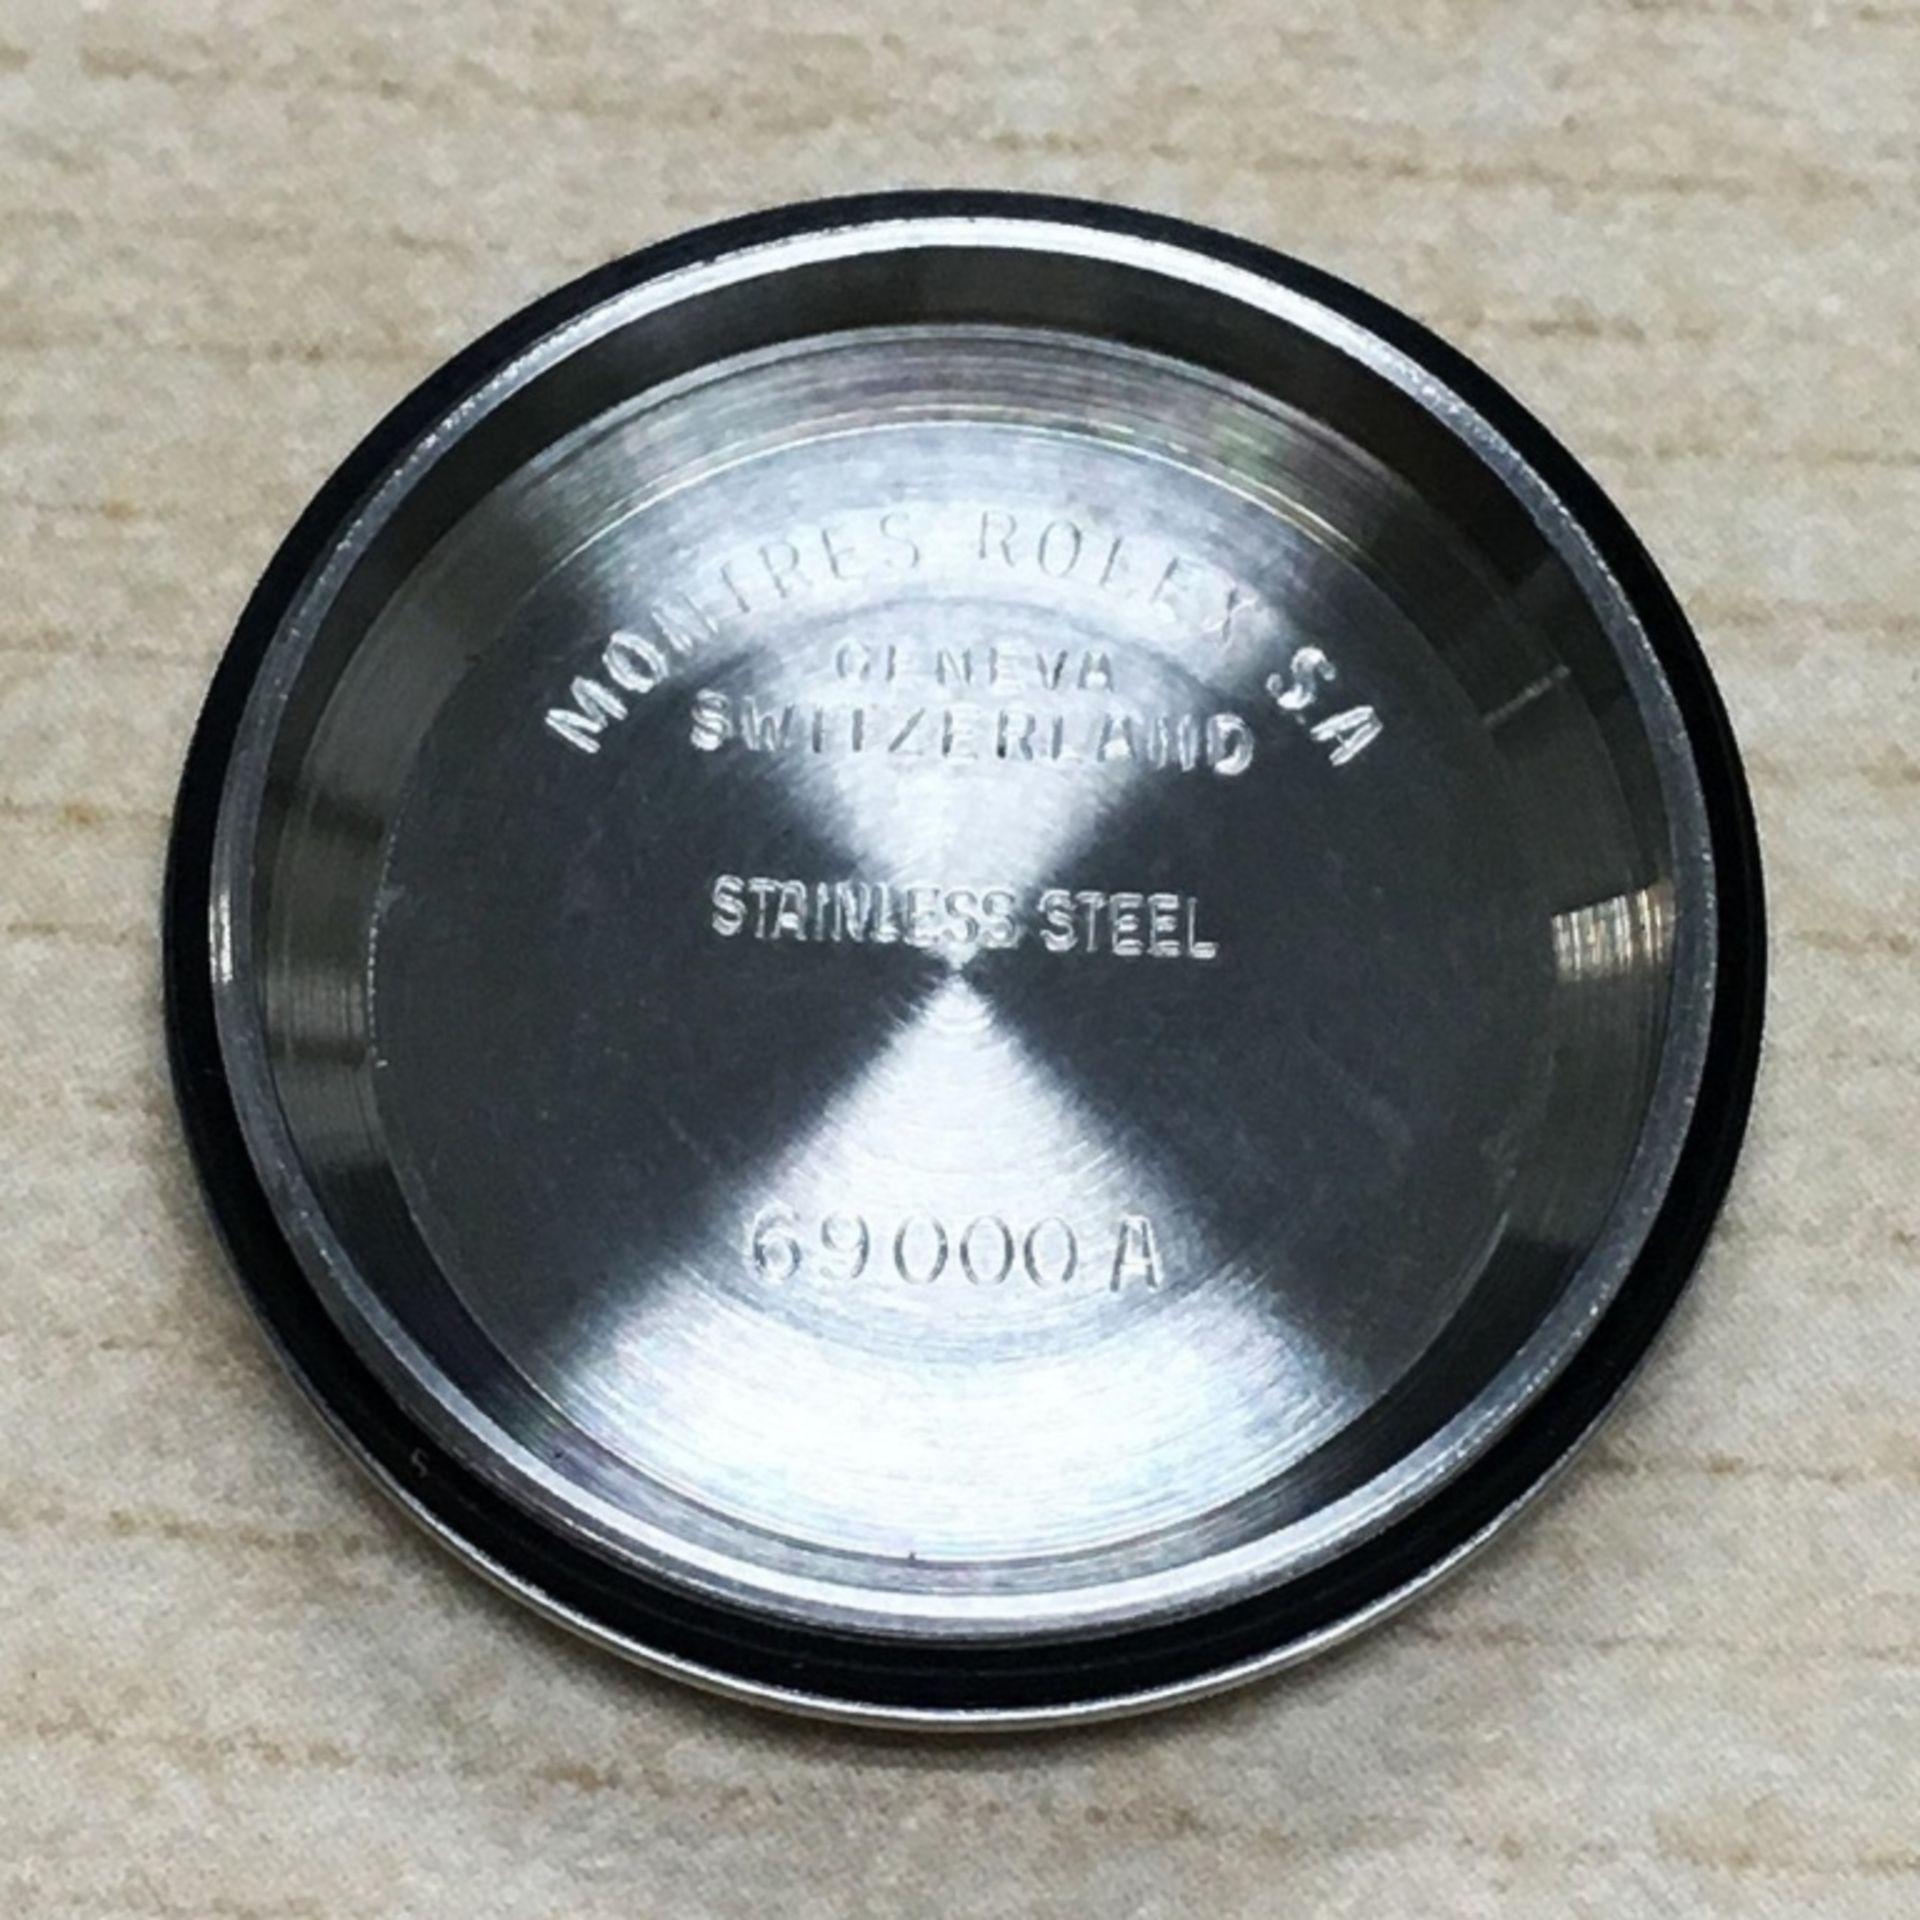 Rolex DateJust 18K & SS 1.00ct Diamond Blue Vignet - Image 5 of 8